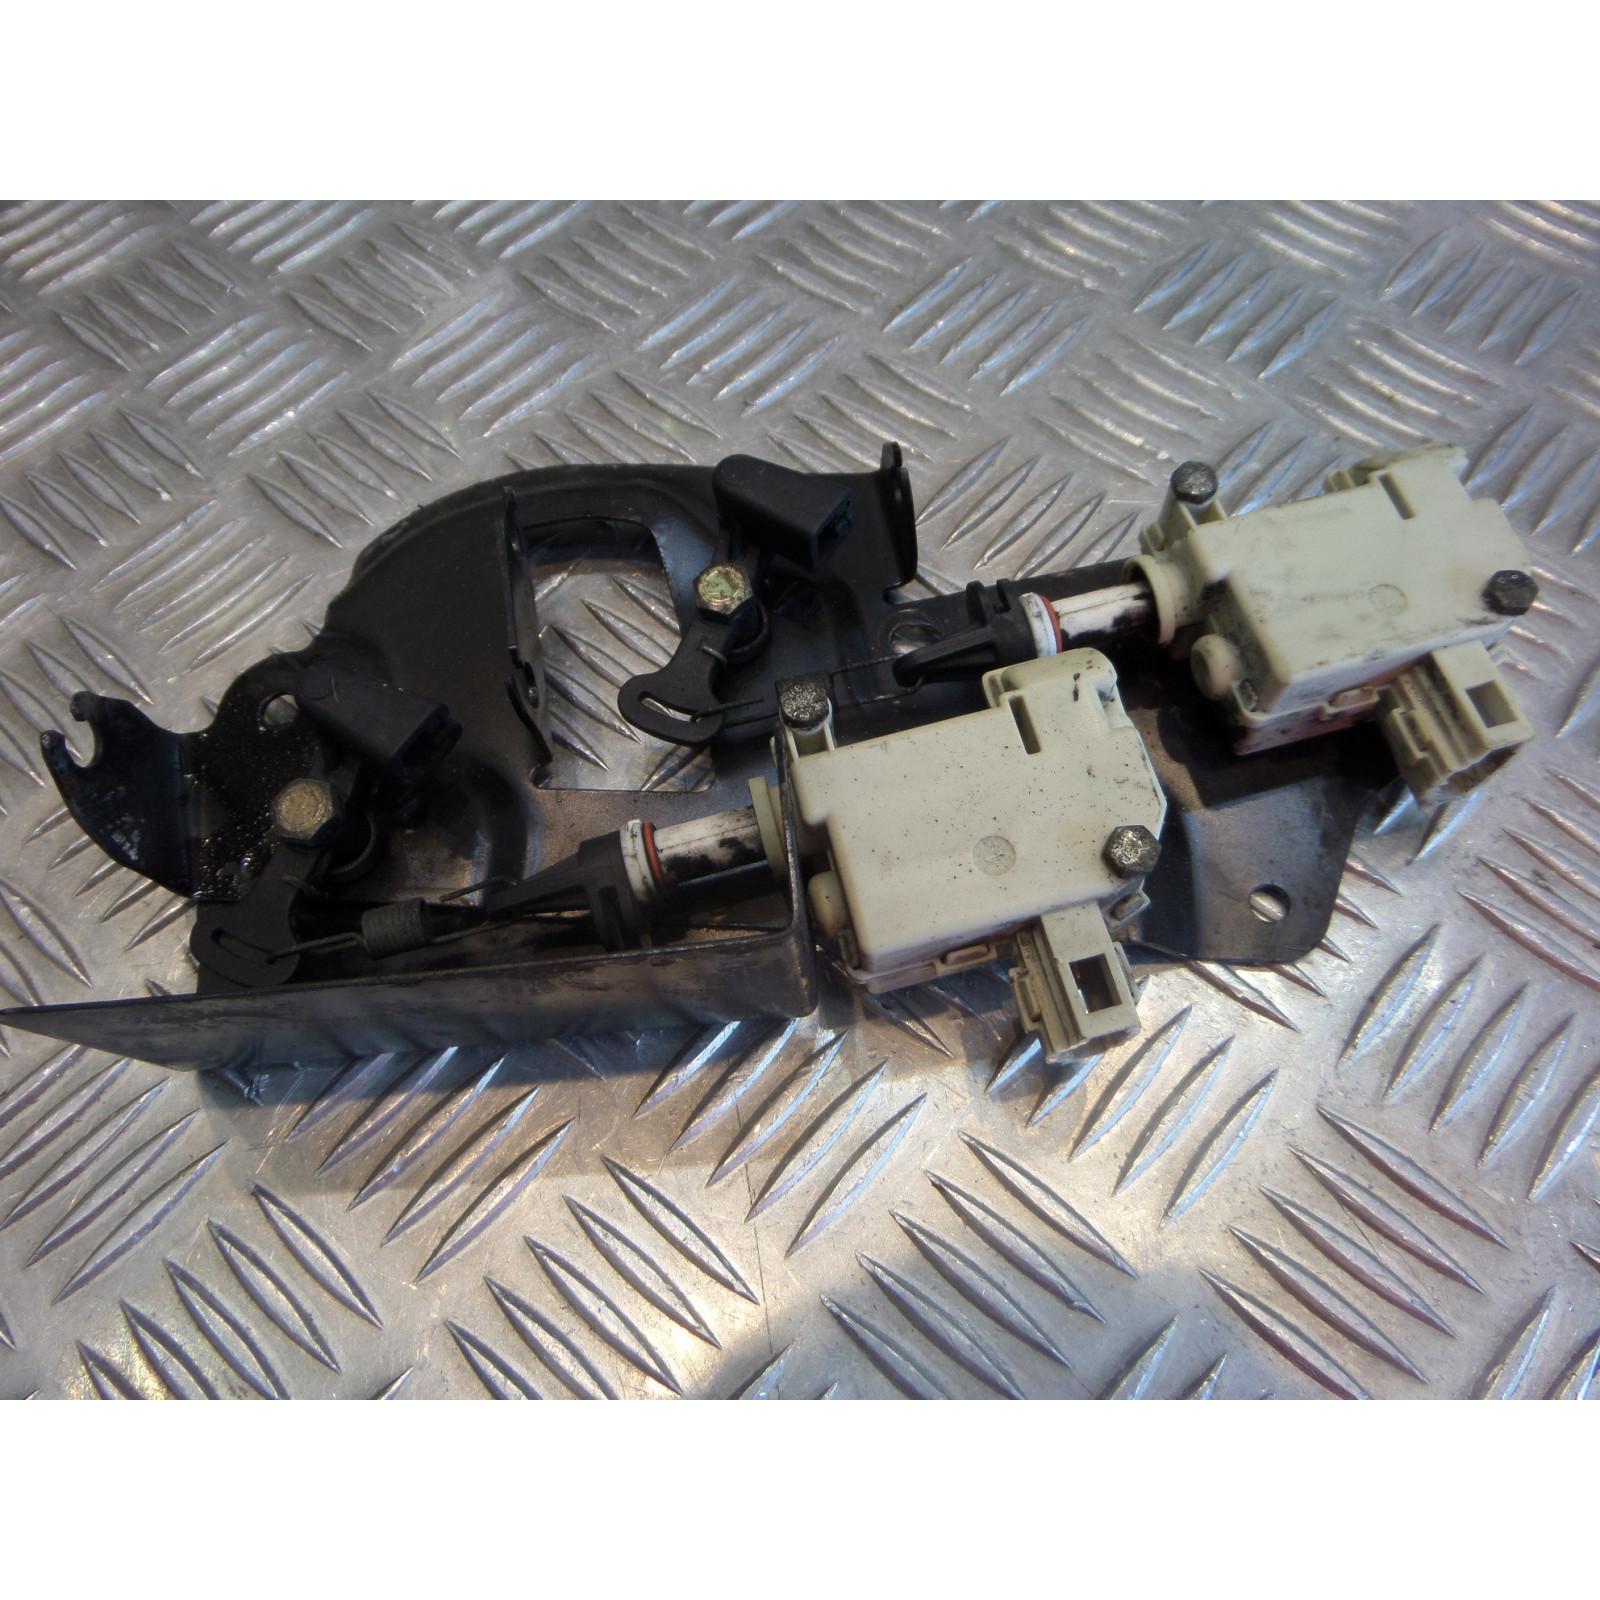 mecanisme verrouillage selle origine scooter piaggio 125 x8